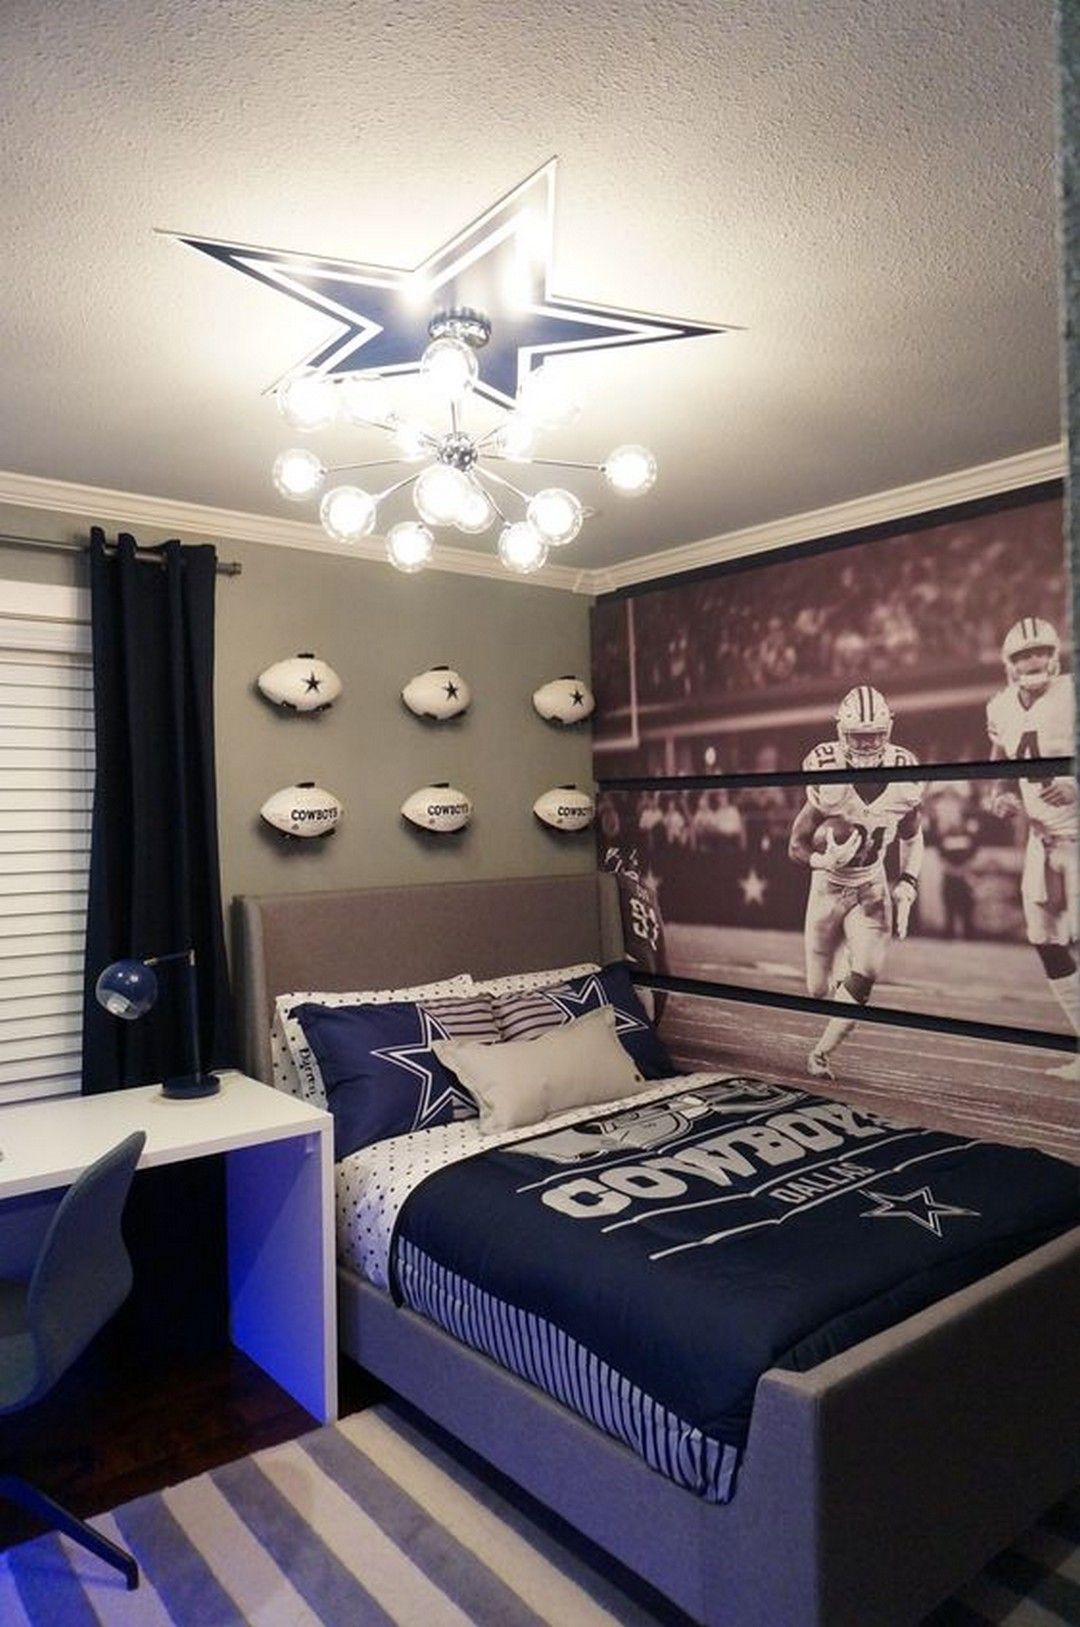 Hockey Bedroom Decor Canada: Lovely Dallas Cowboys Theme Bedroom Ideas For The Big Fans